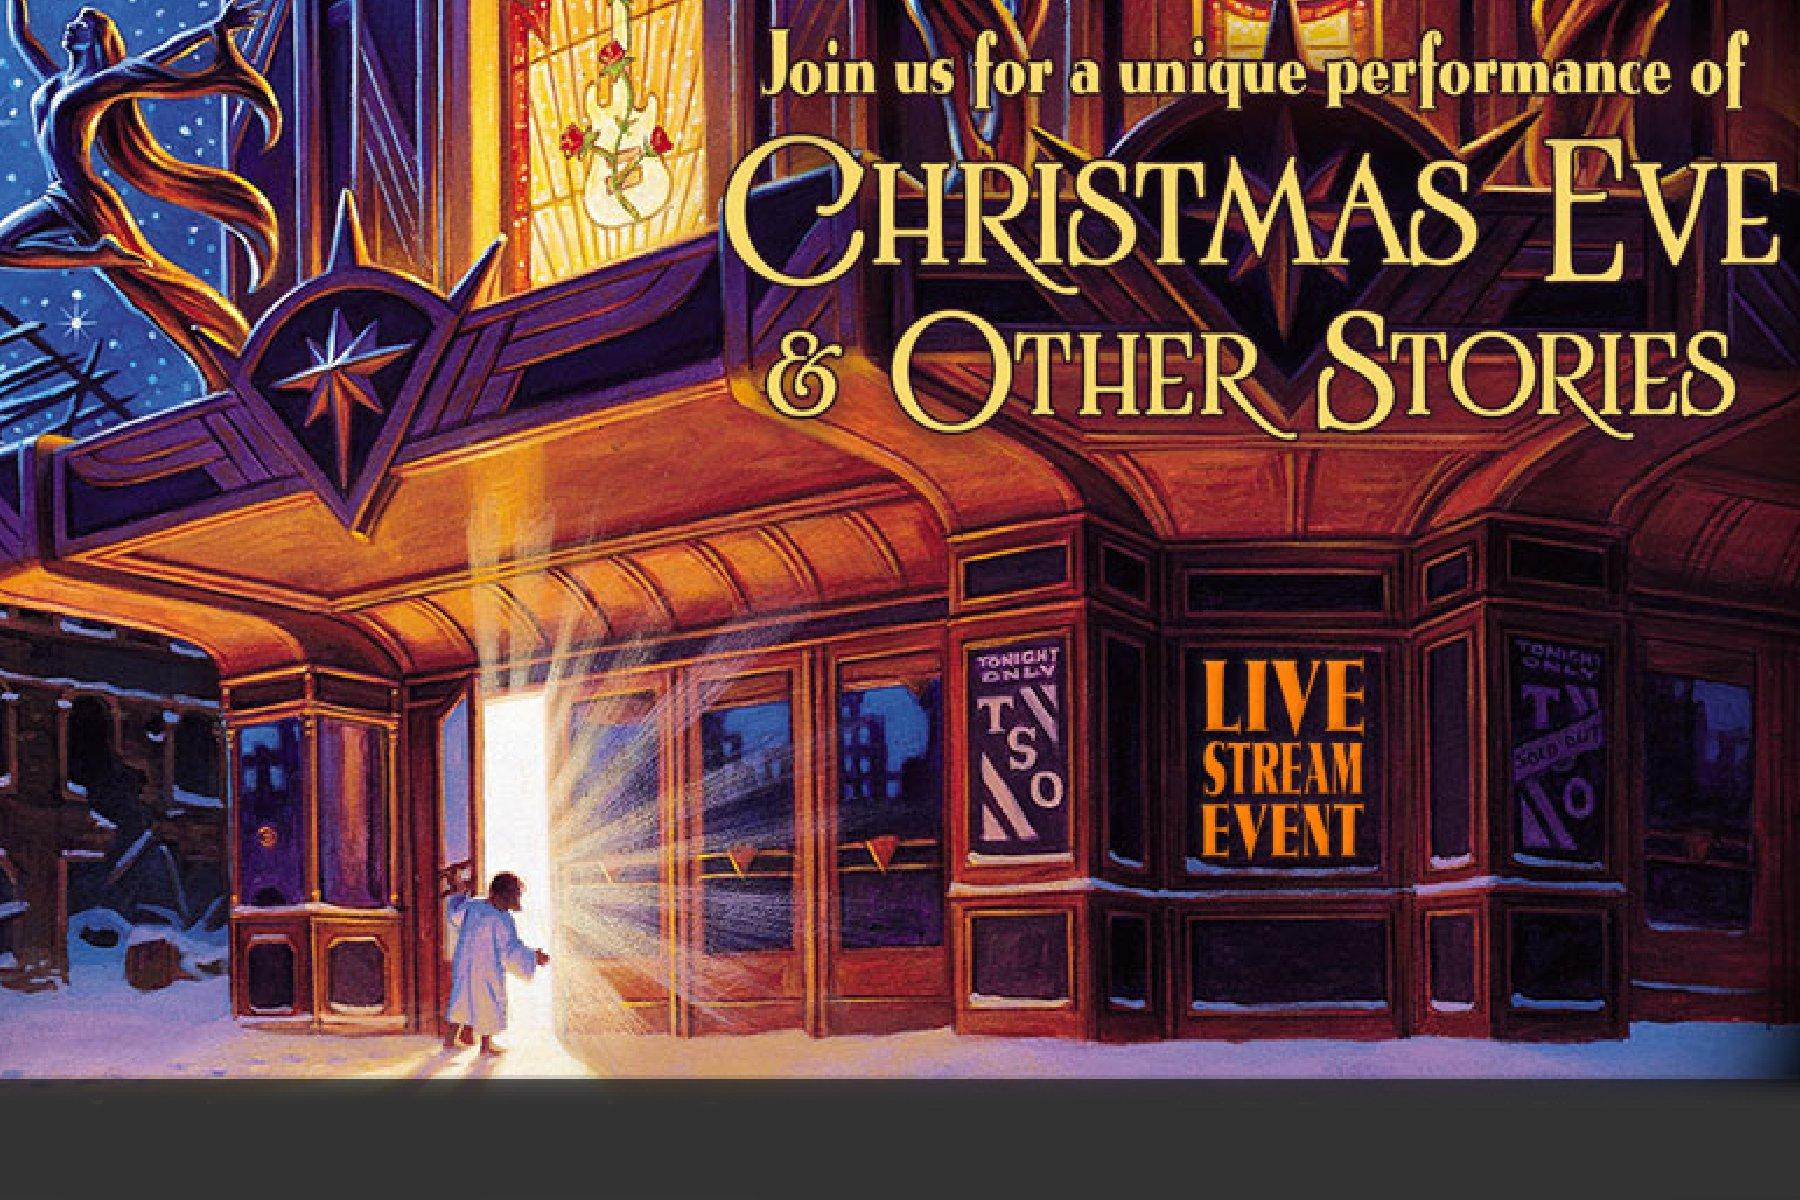 Trans Siberian Orchestra Live Stream Event